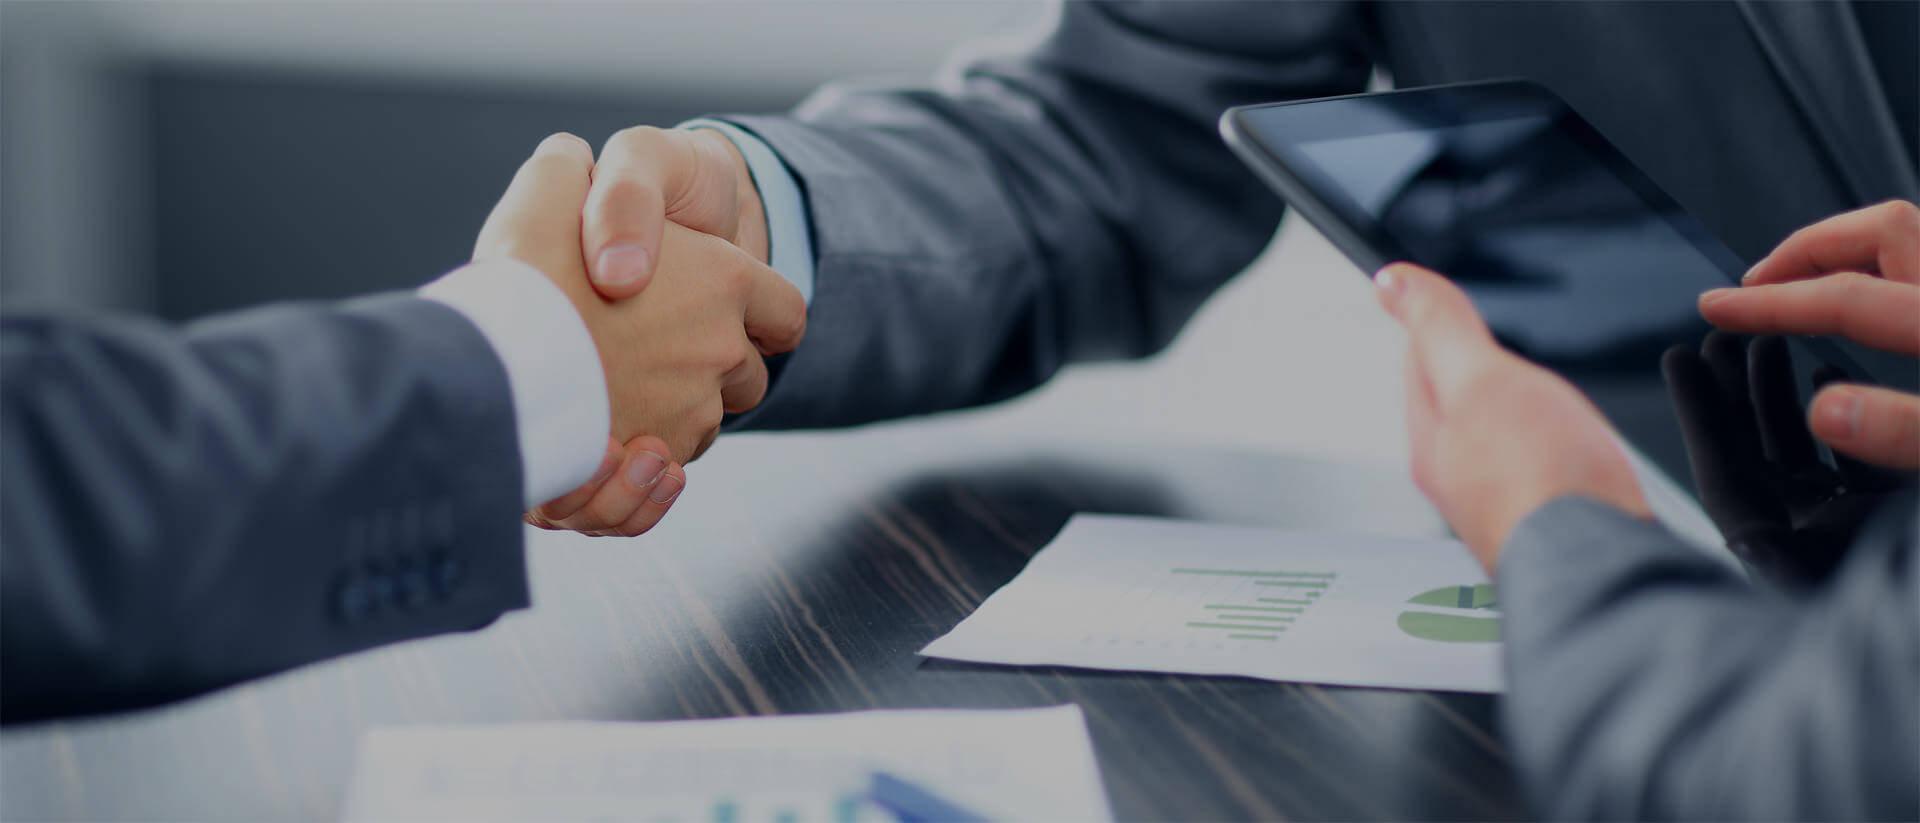 supply-chain-management-vendor-partnership.jpg